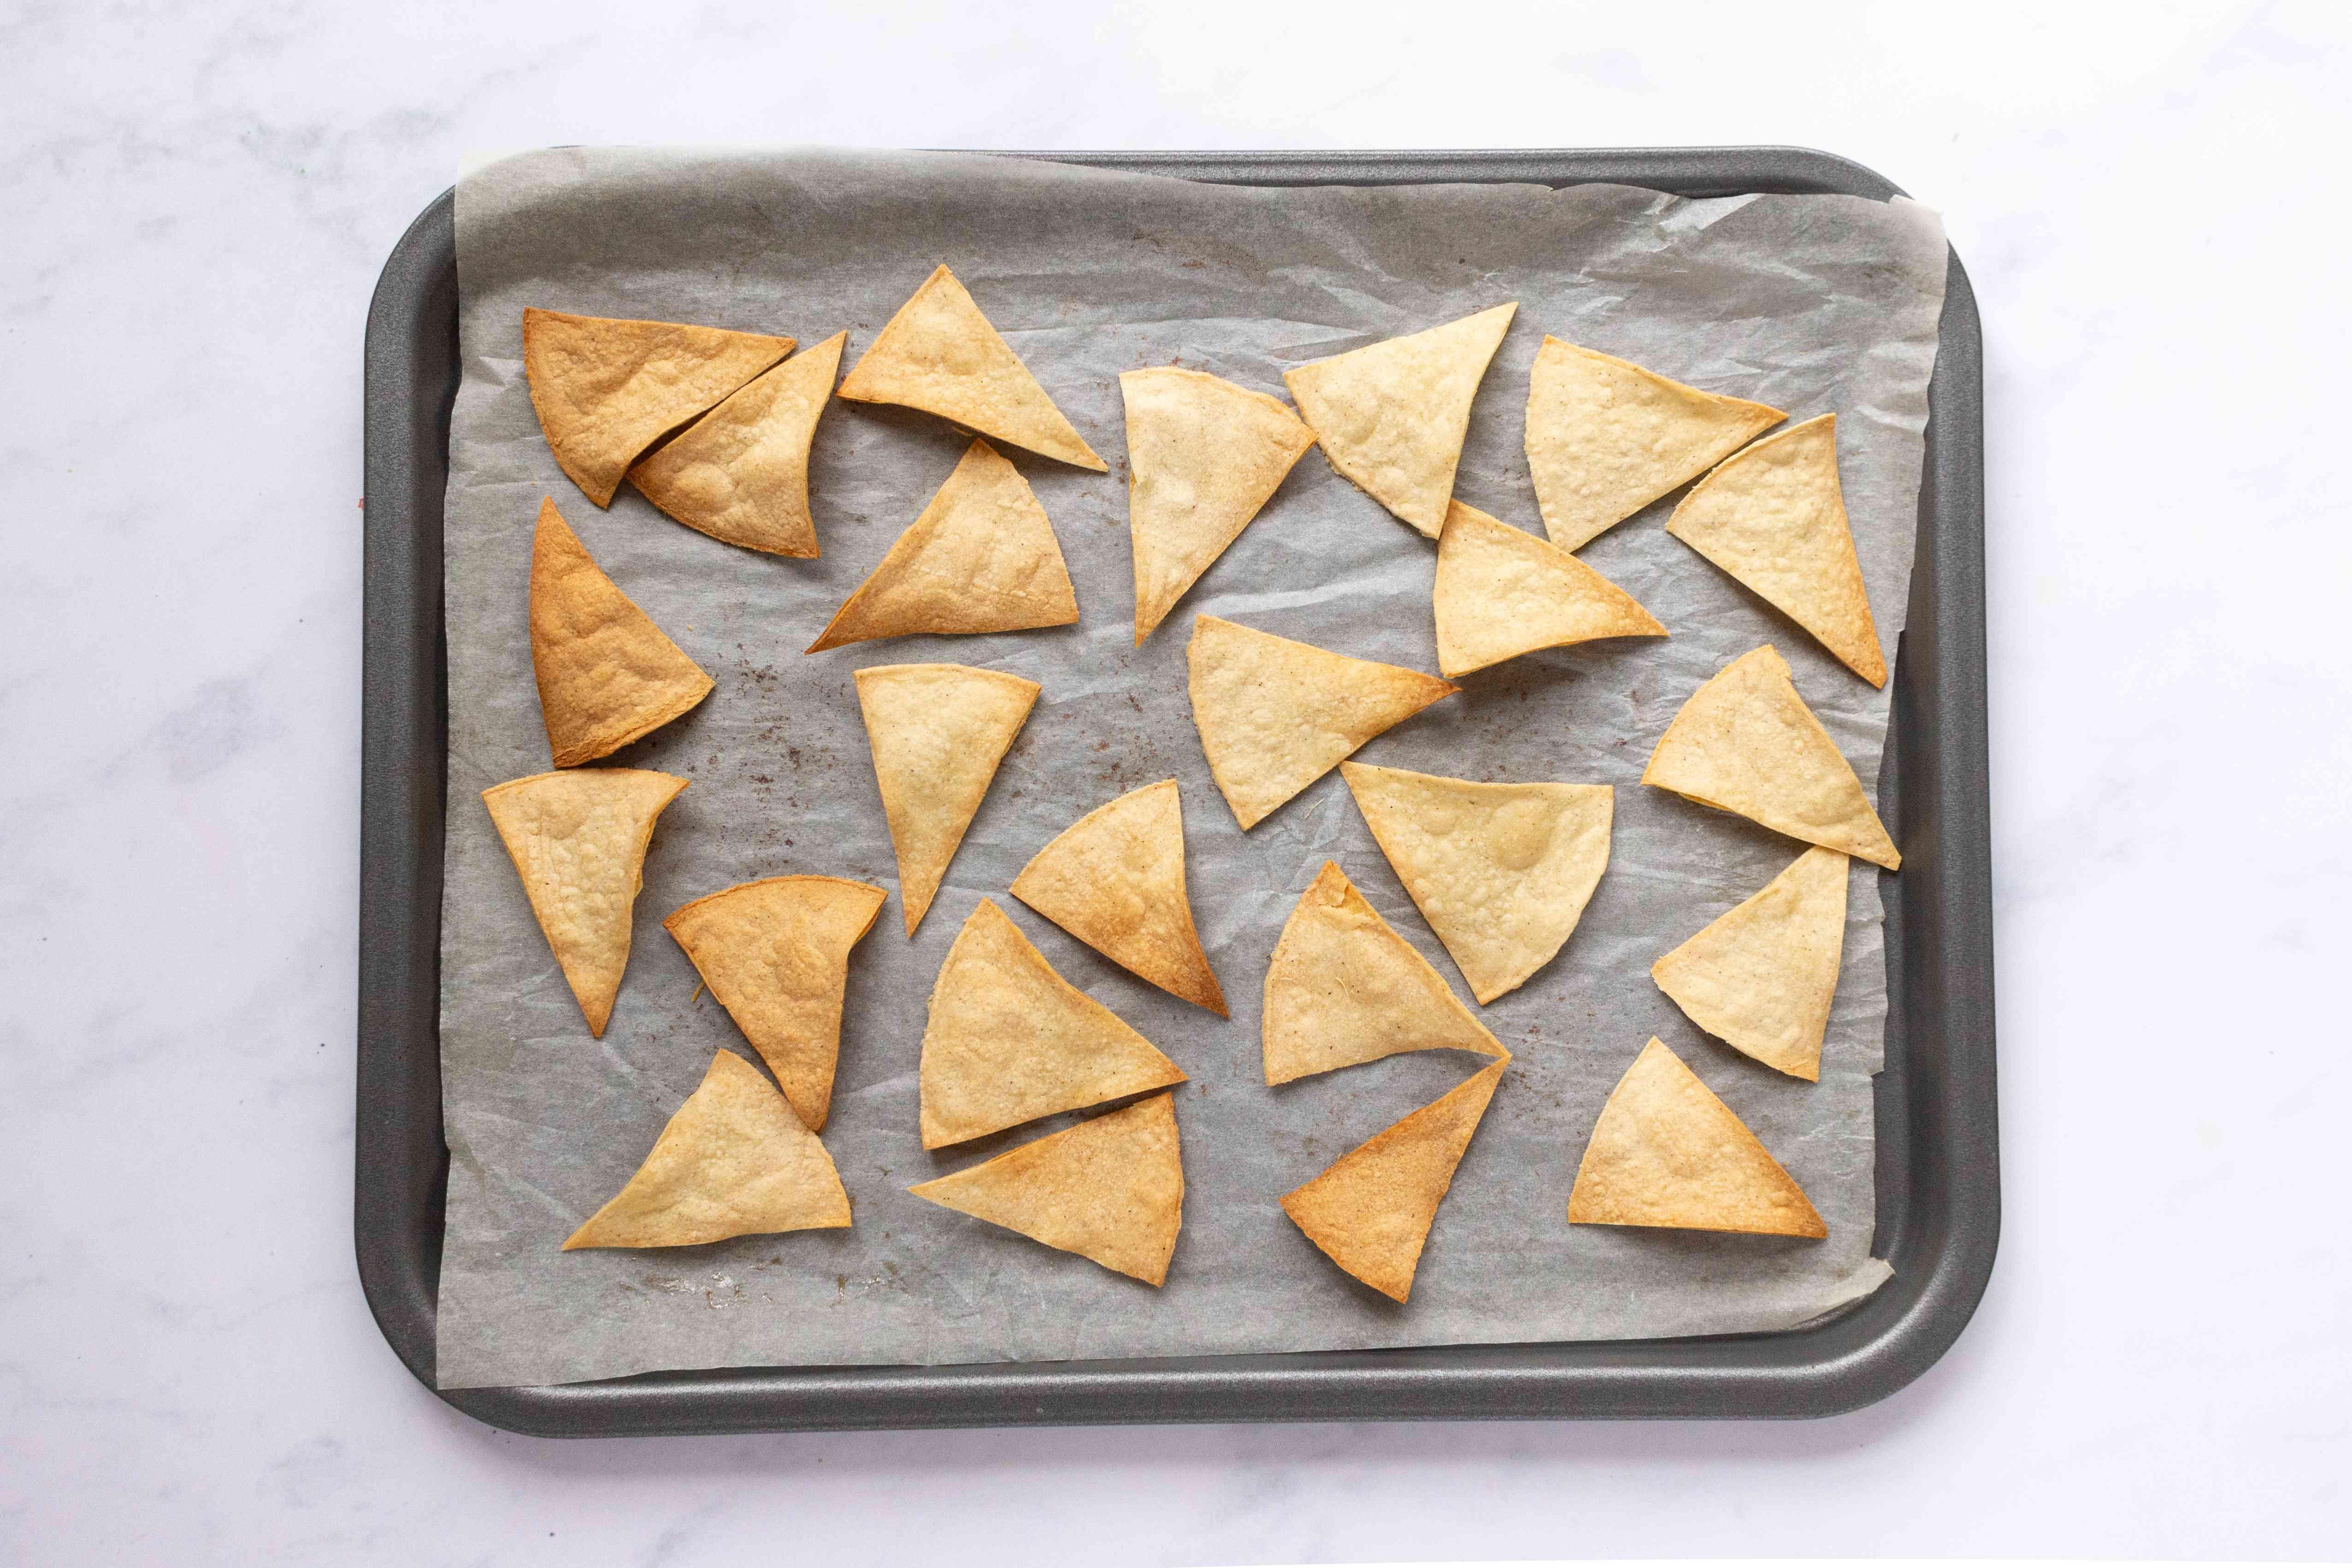 Homemade Totopos (Crunchy Corn Tortilla Chips) on a baking sheet